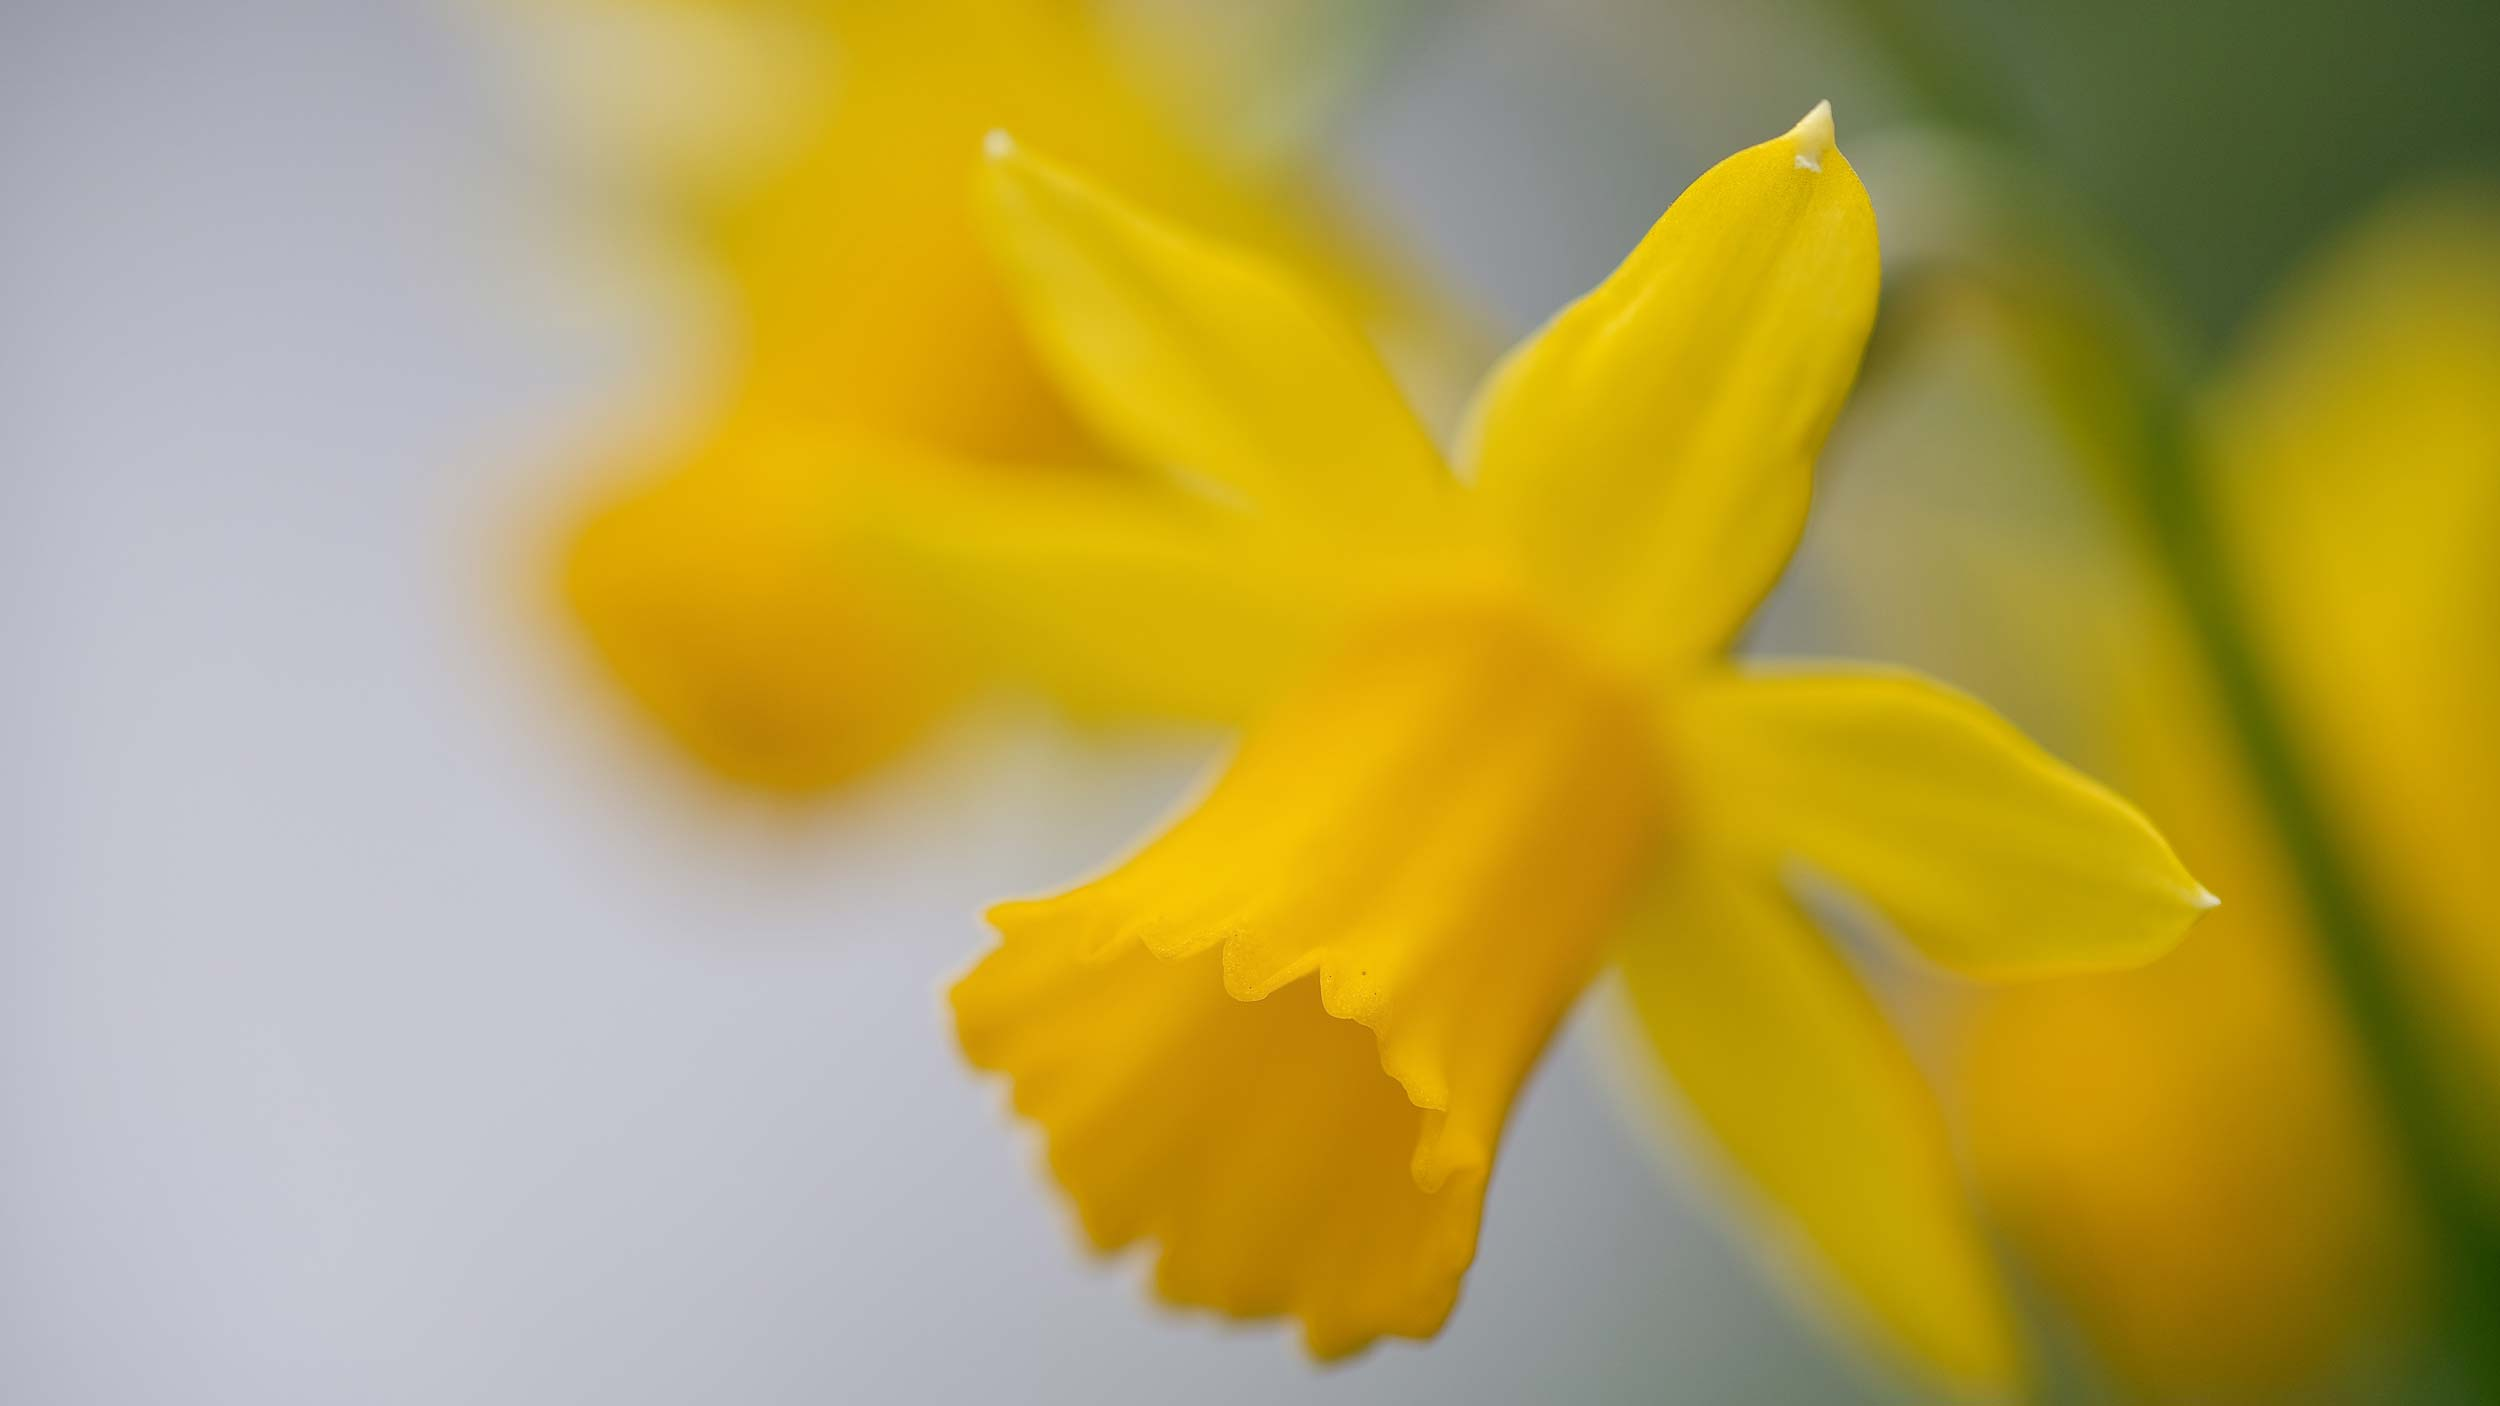 Yellow daffodil photo by Wolfgang Hasselmann on Unsplash